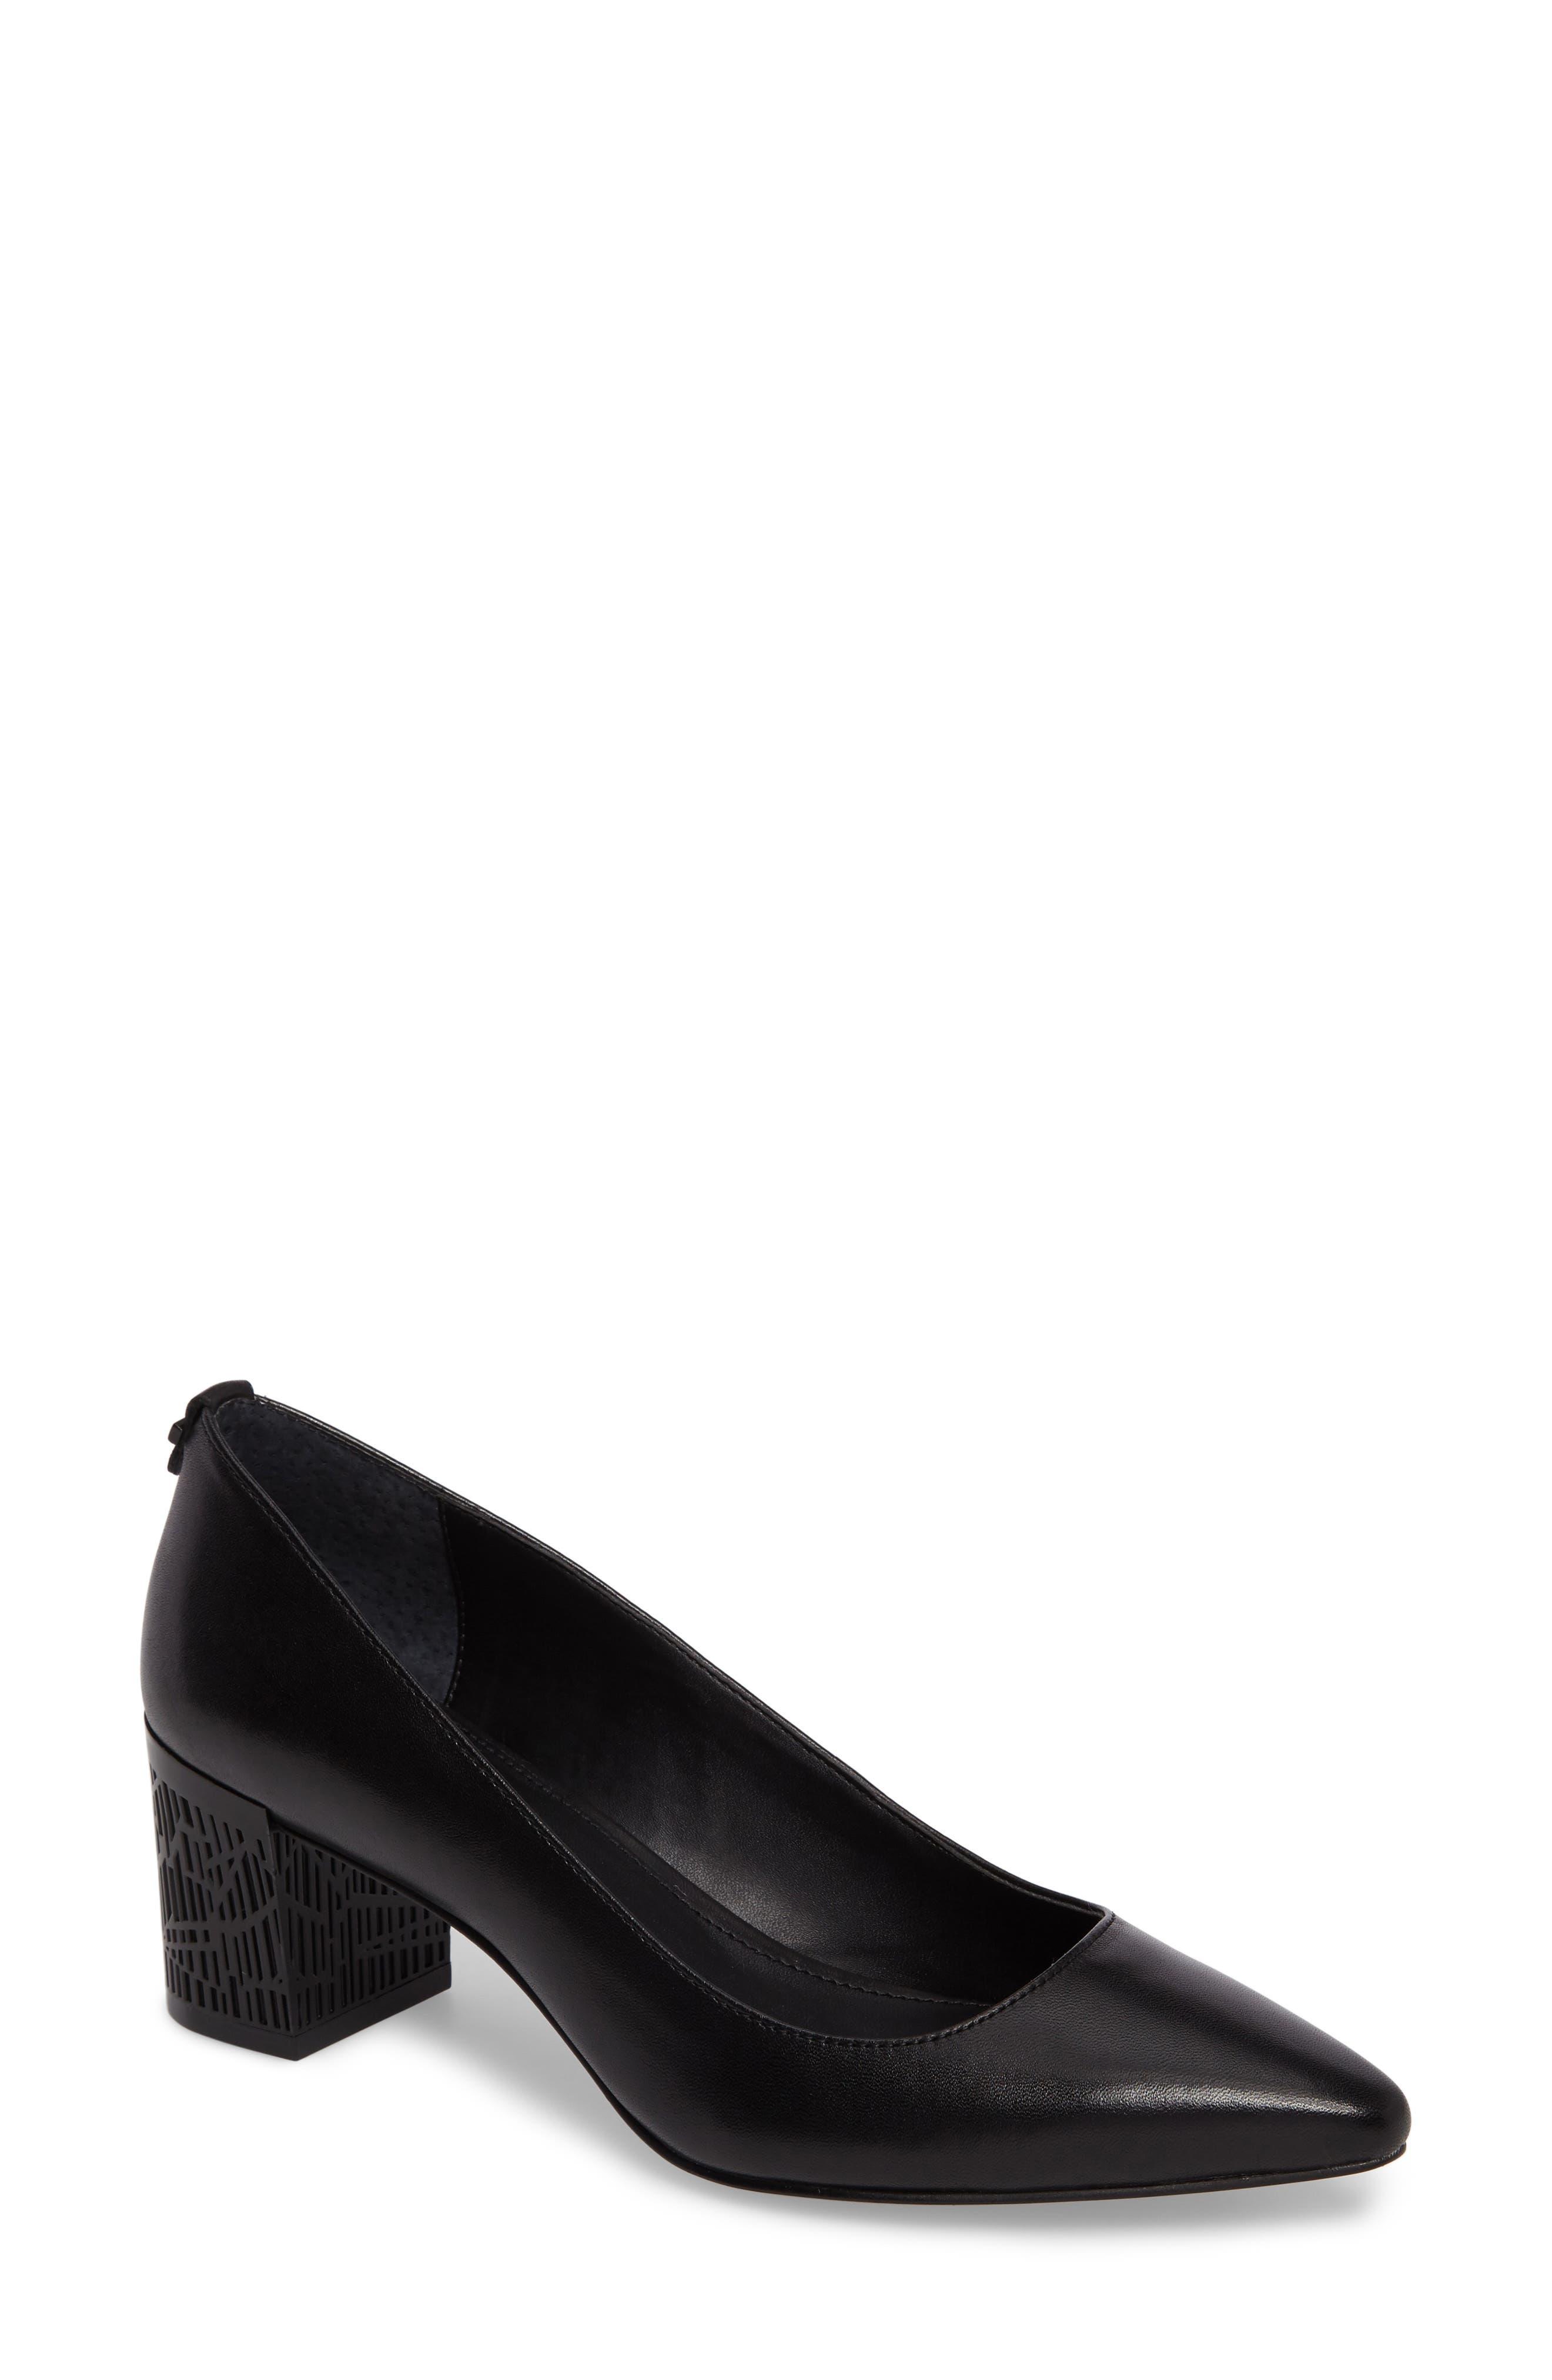 Natalynn 2 Texture Heel Pump,                         Main,                         color, Black